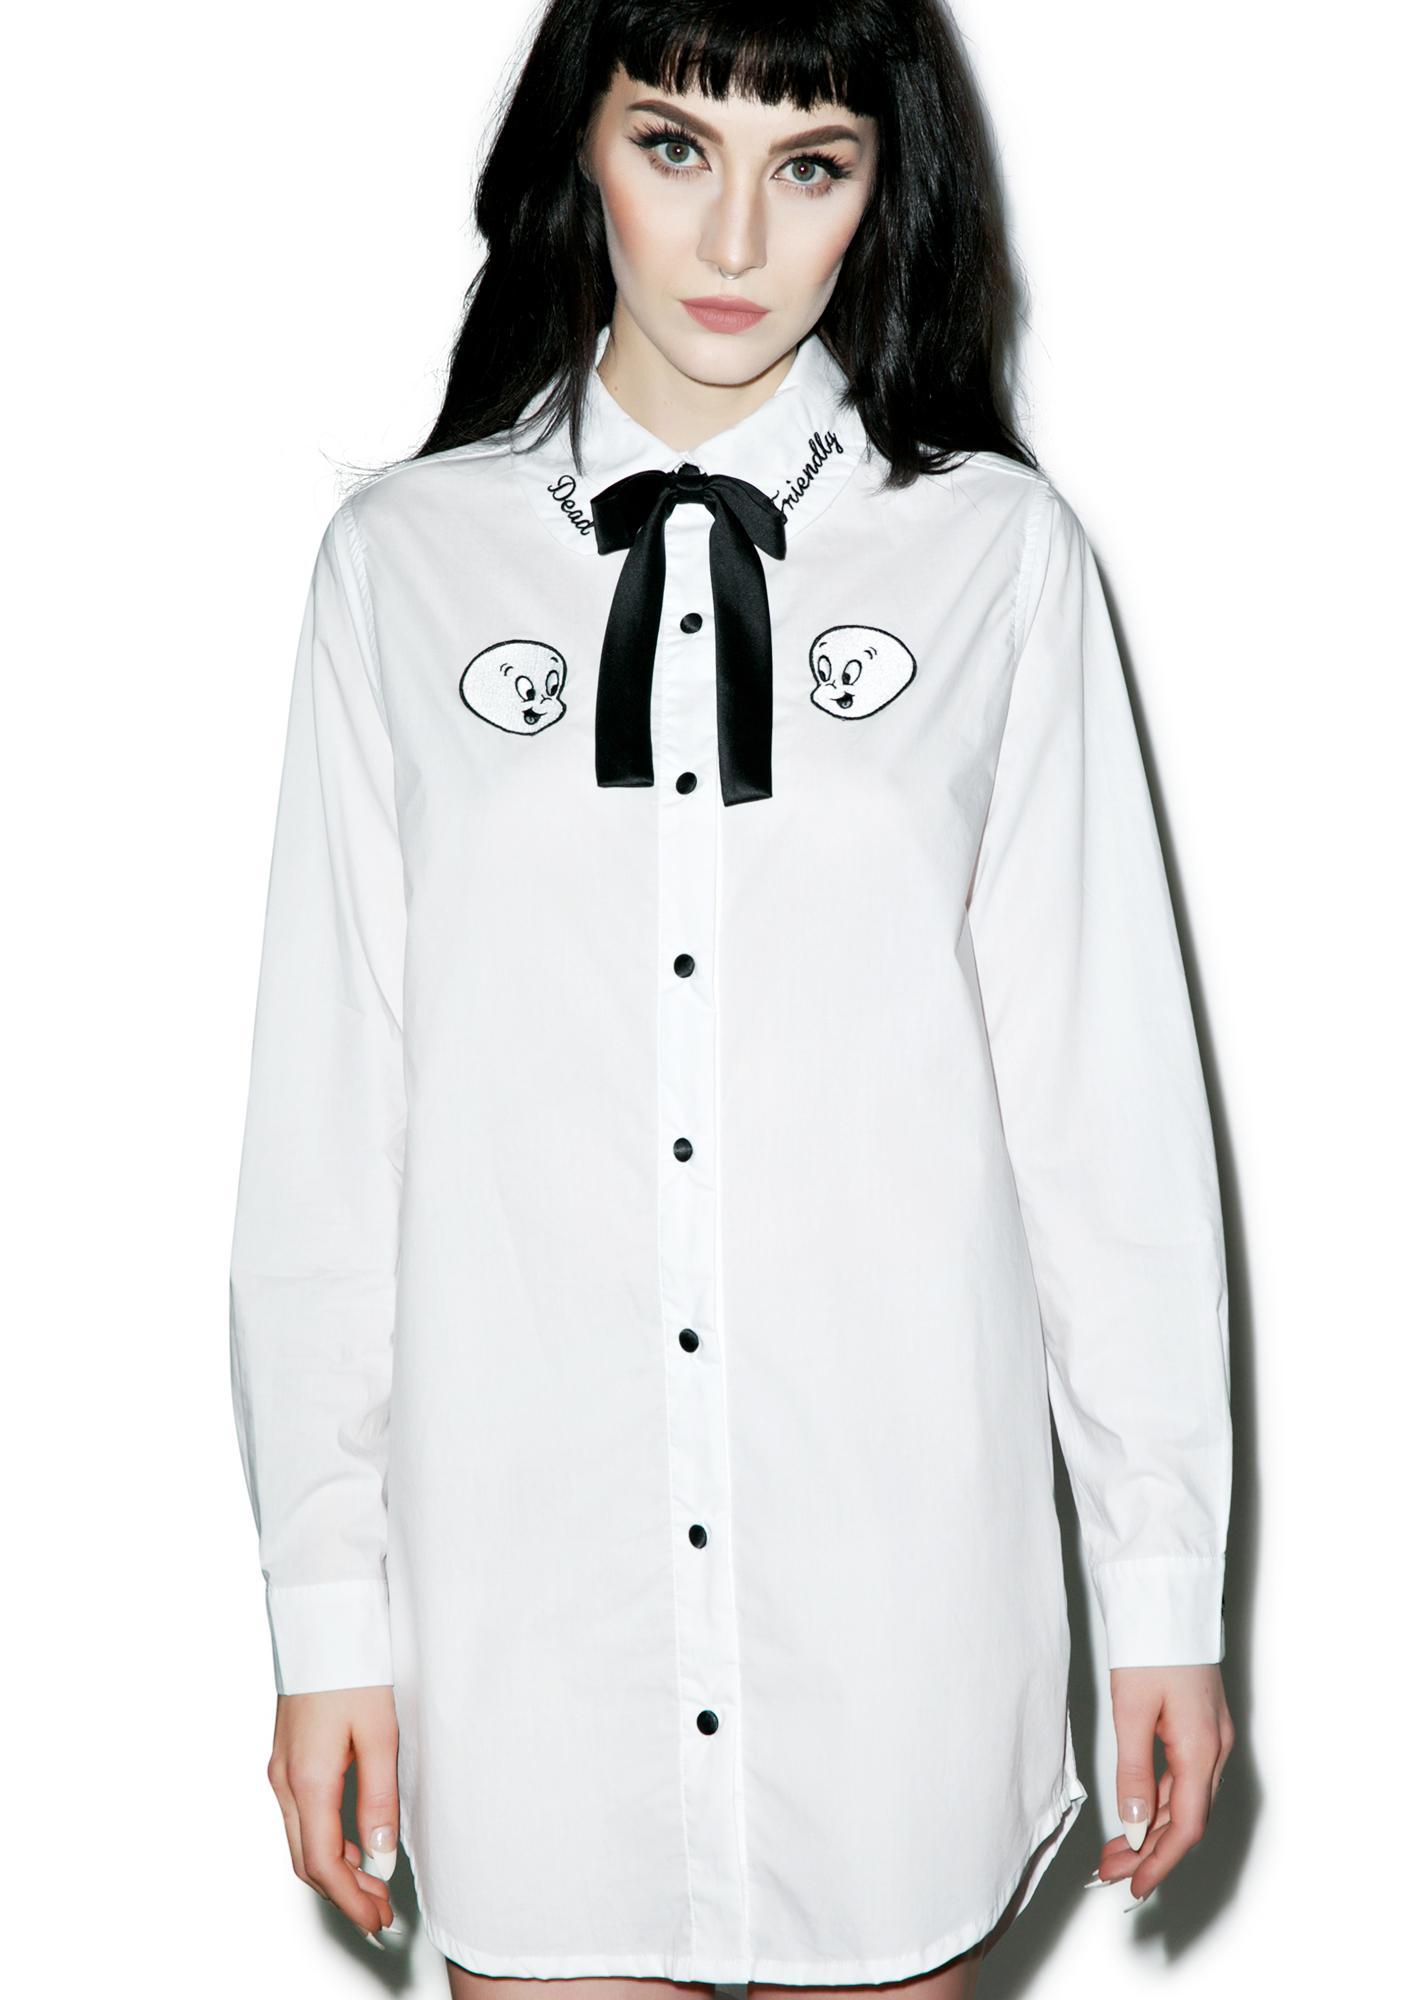 Lazy Oaf X Casper Friendly Dead Shirt